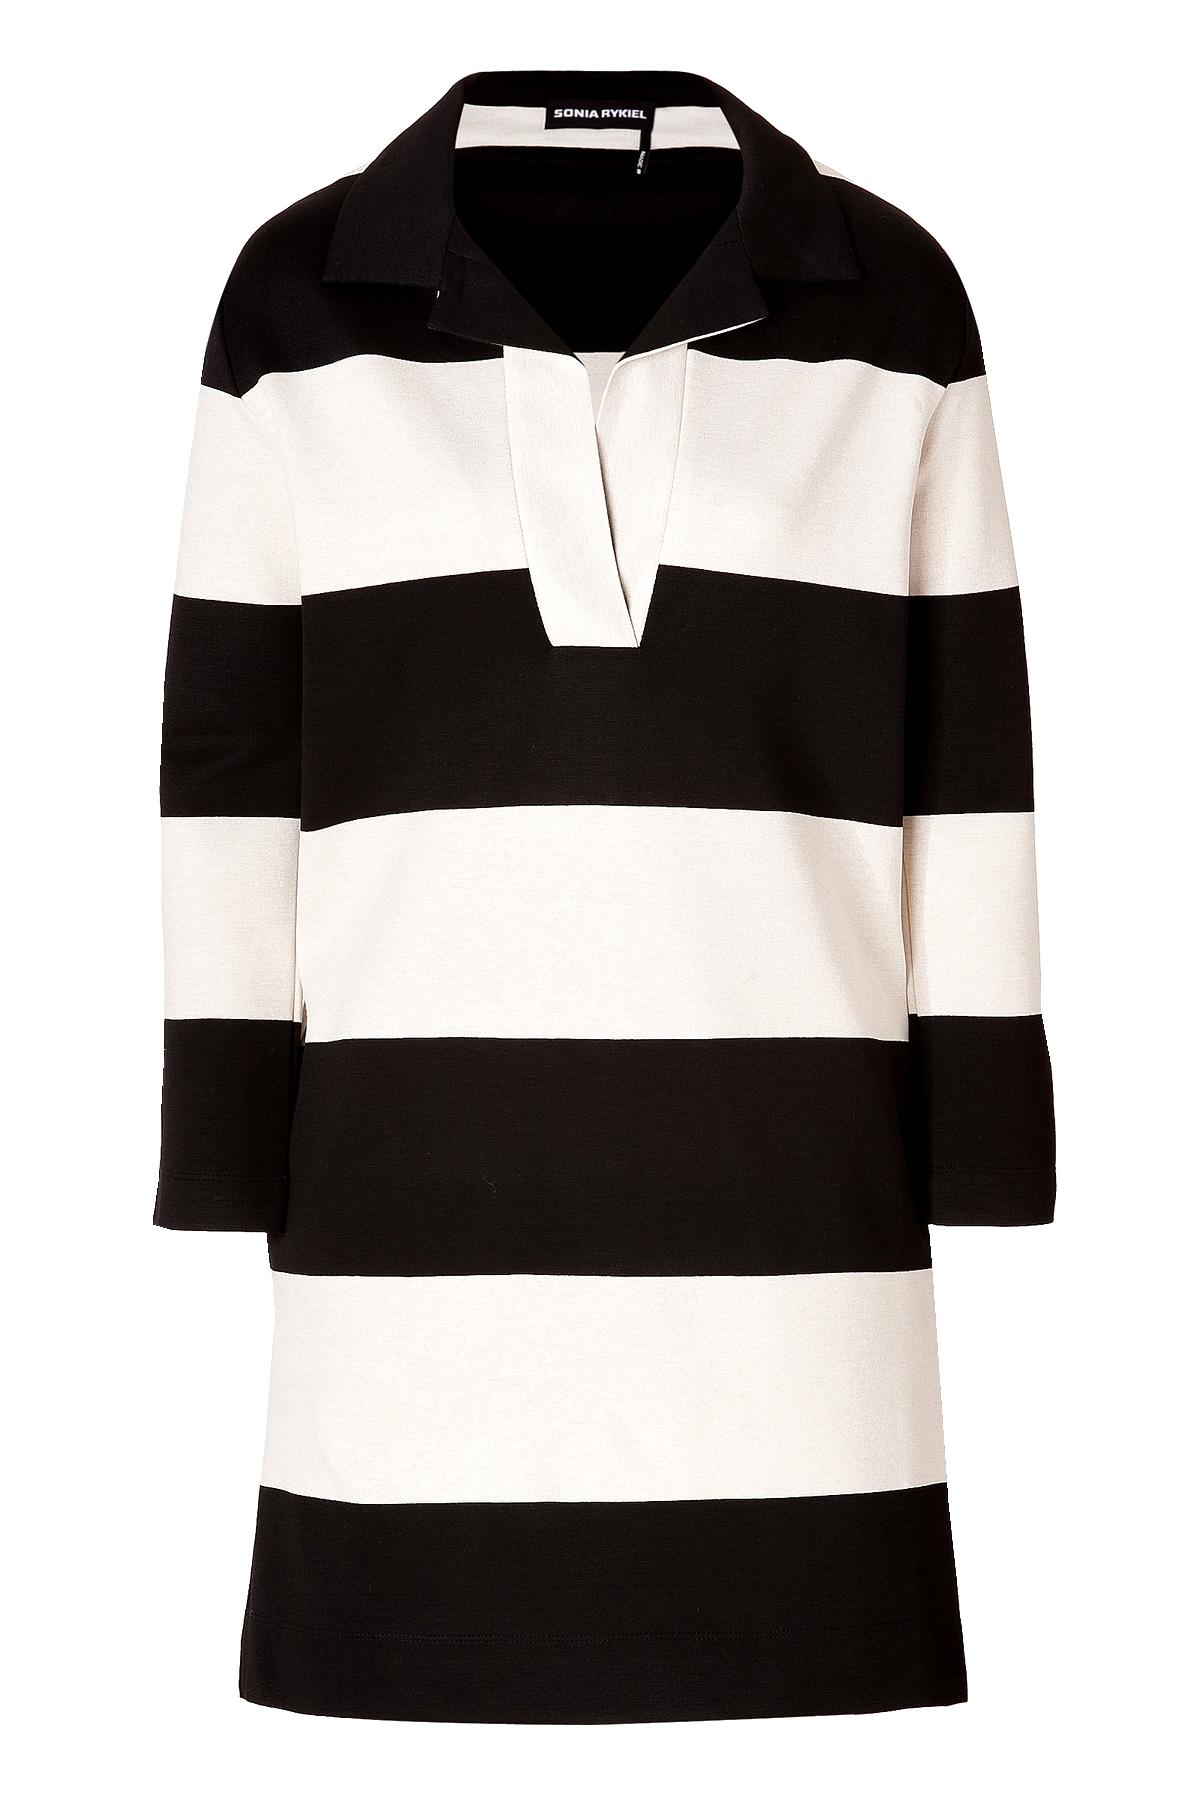 Sonia Rykiel stripe Knit Dress Black Off-White